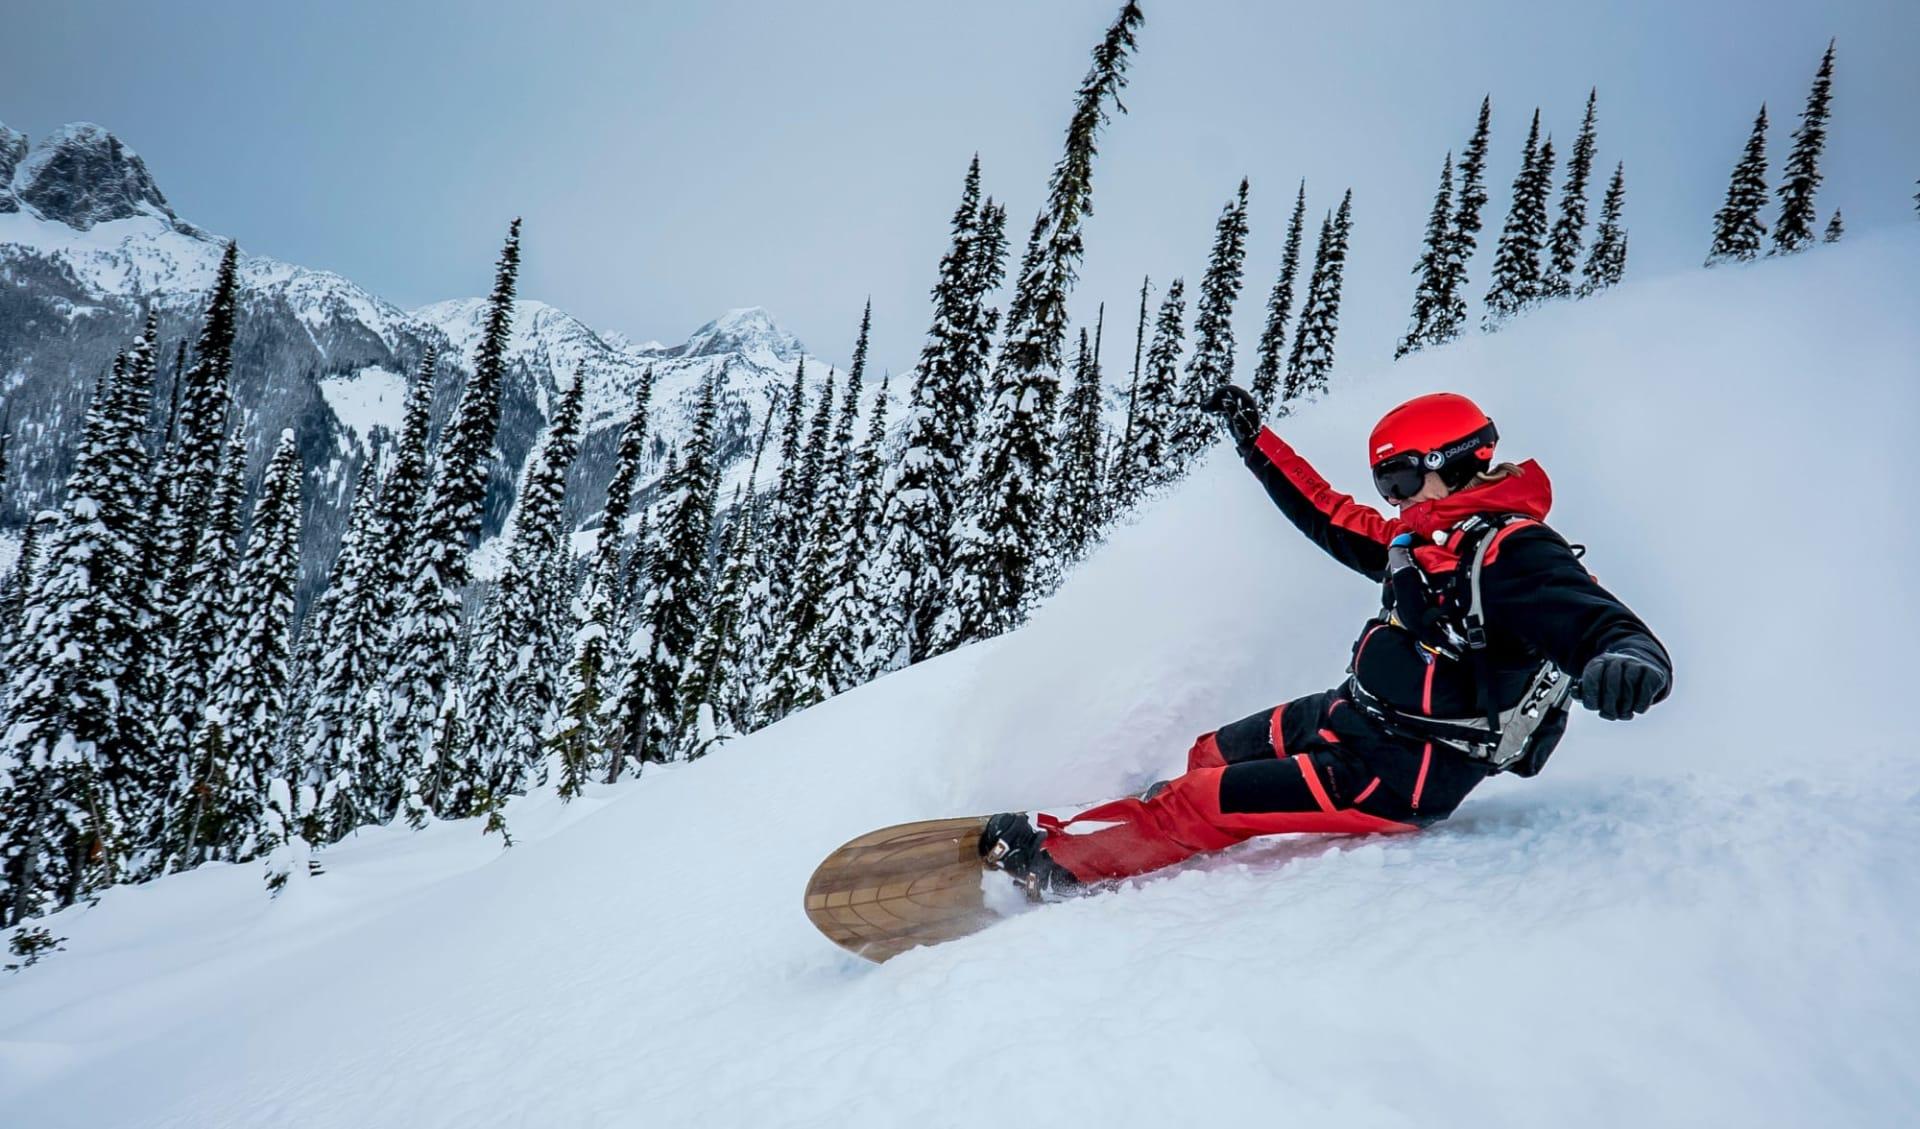 Galena 7 Tage (CMH) ab Kelowna: Kanada - CMH - Galena - Snowboarder